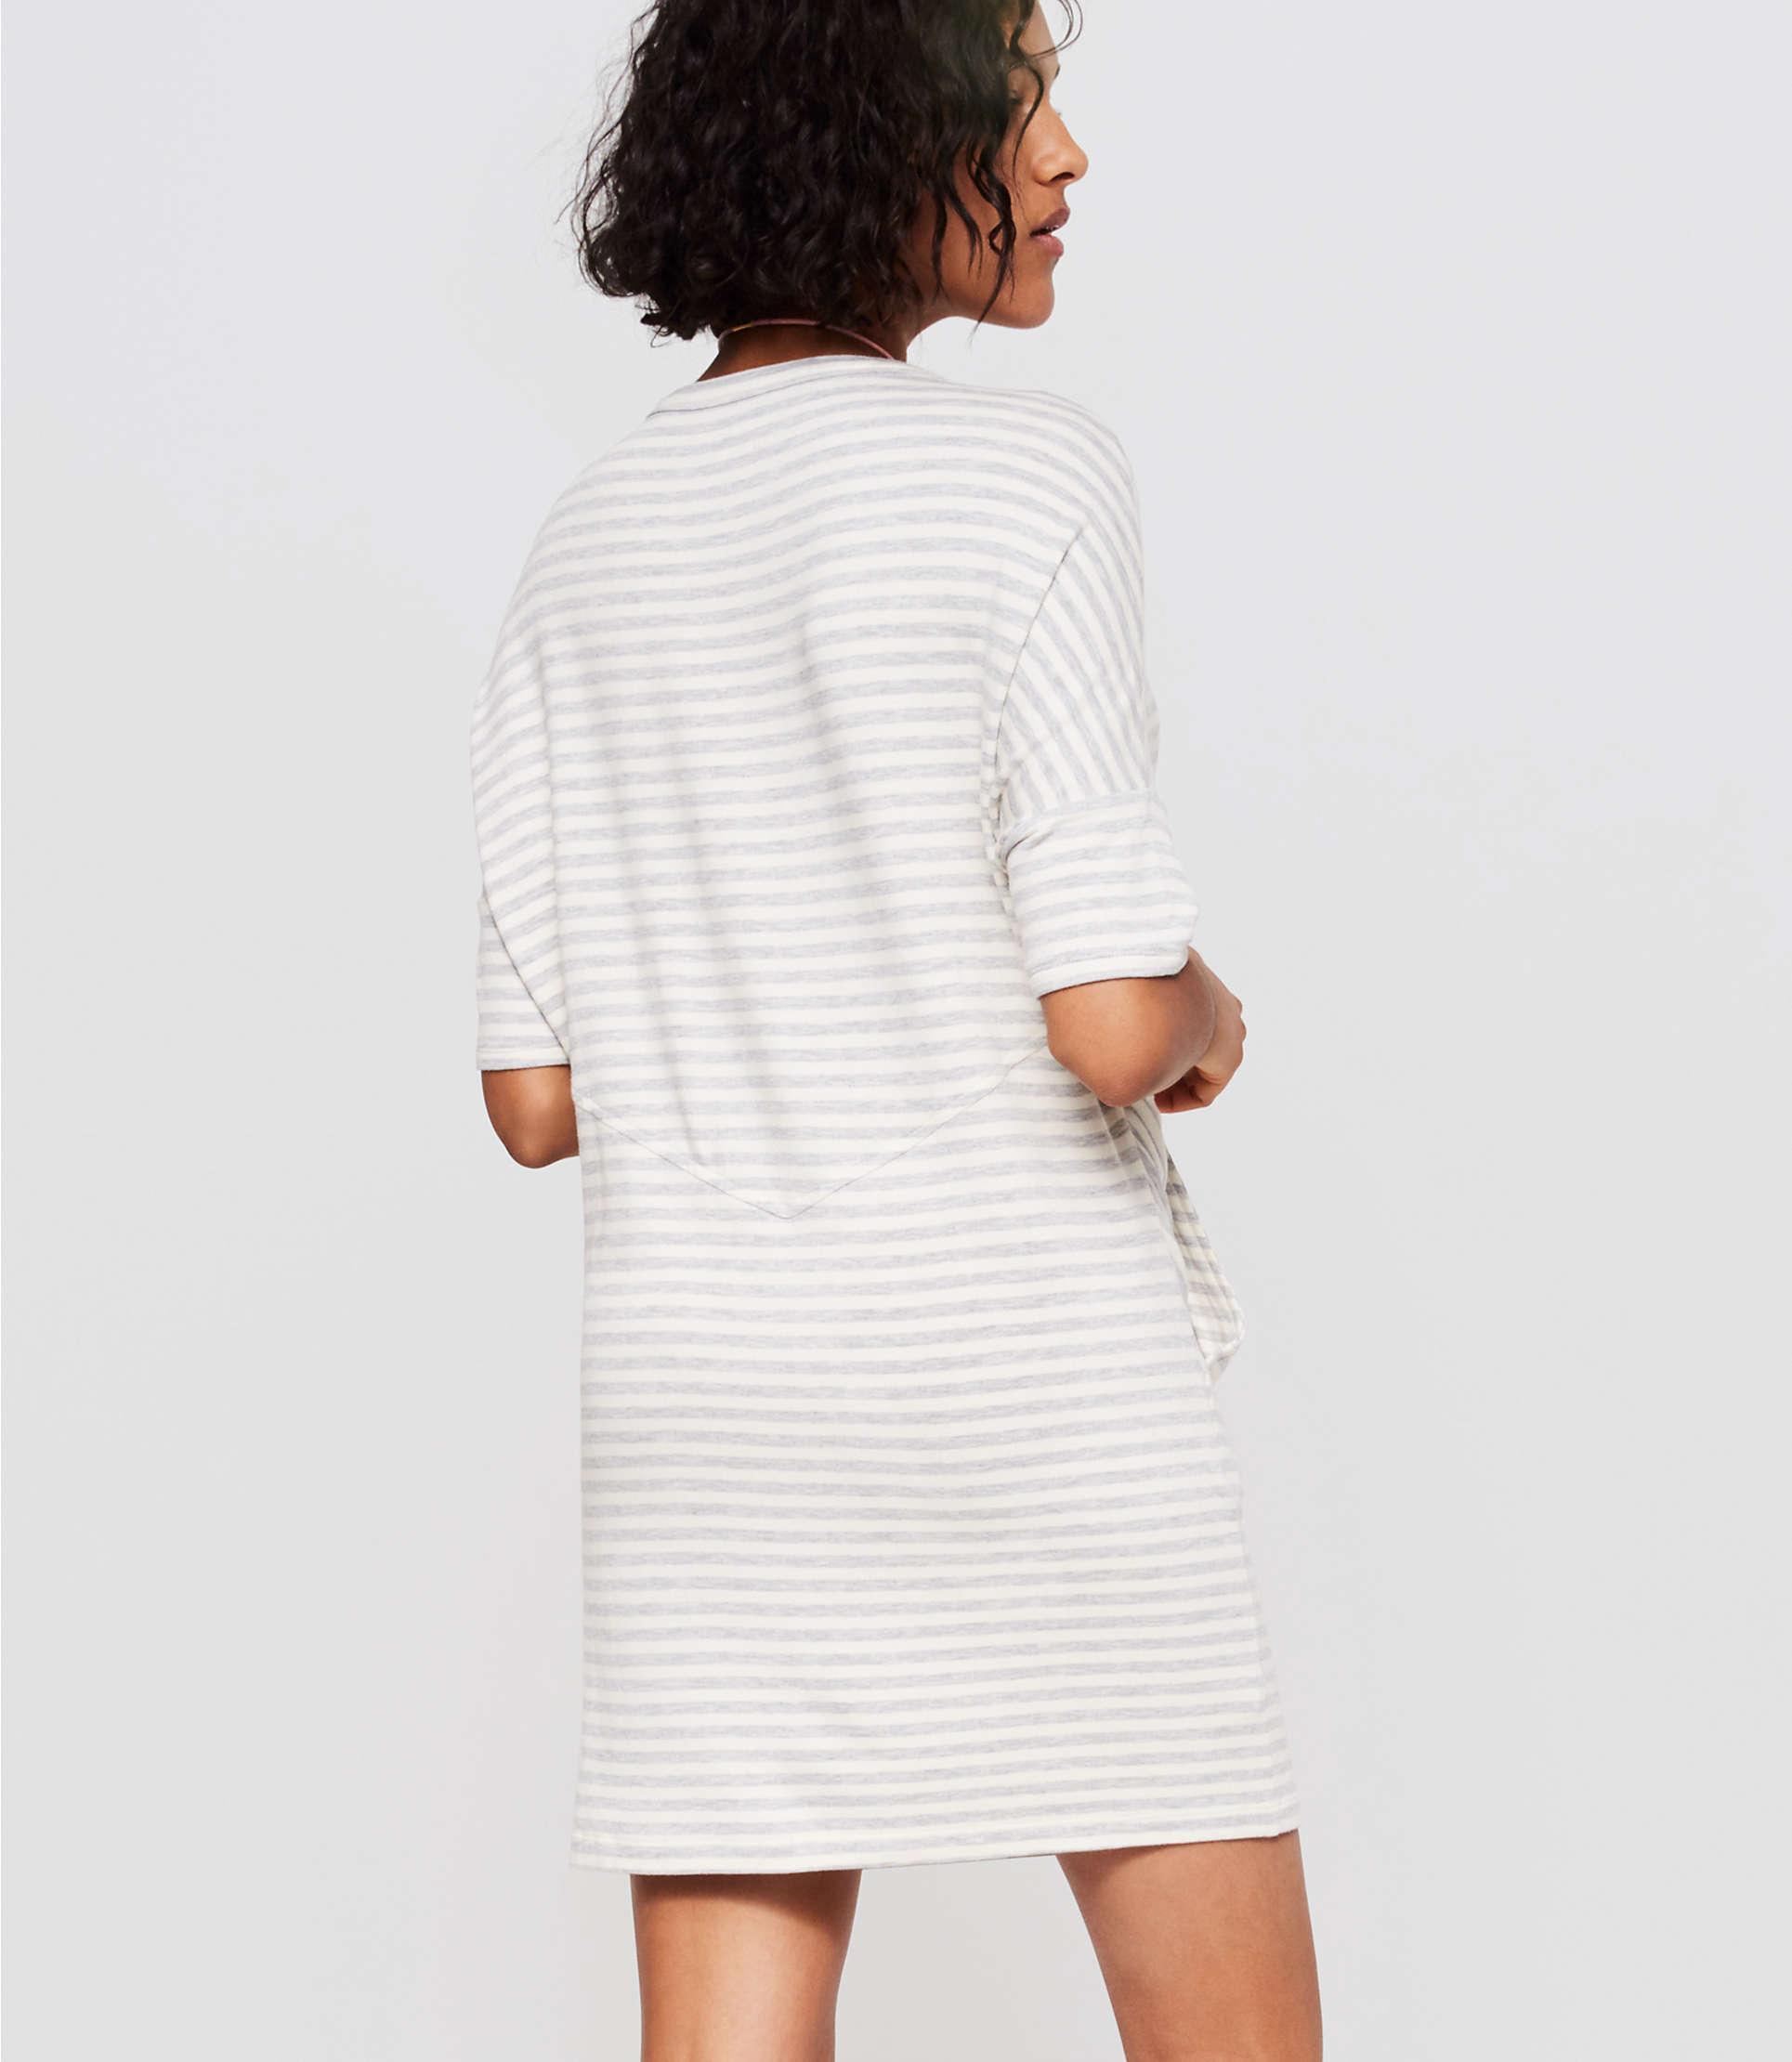 5ef70d53cbf Lyst - Loft Lou   Grey Striped Signaturesoft Dropshoulder Dress in Gray